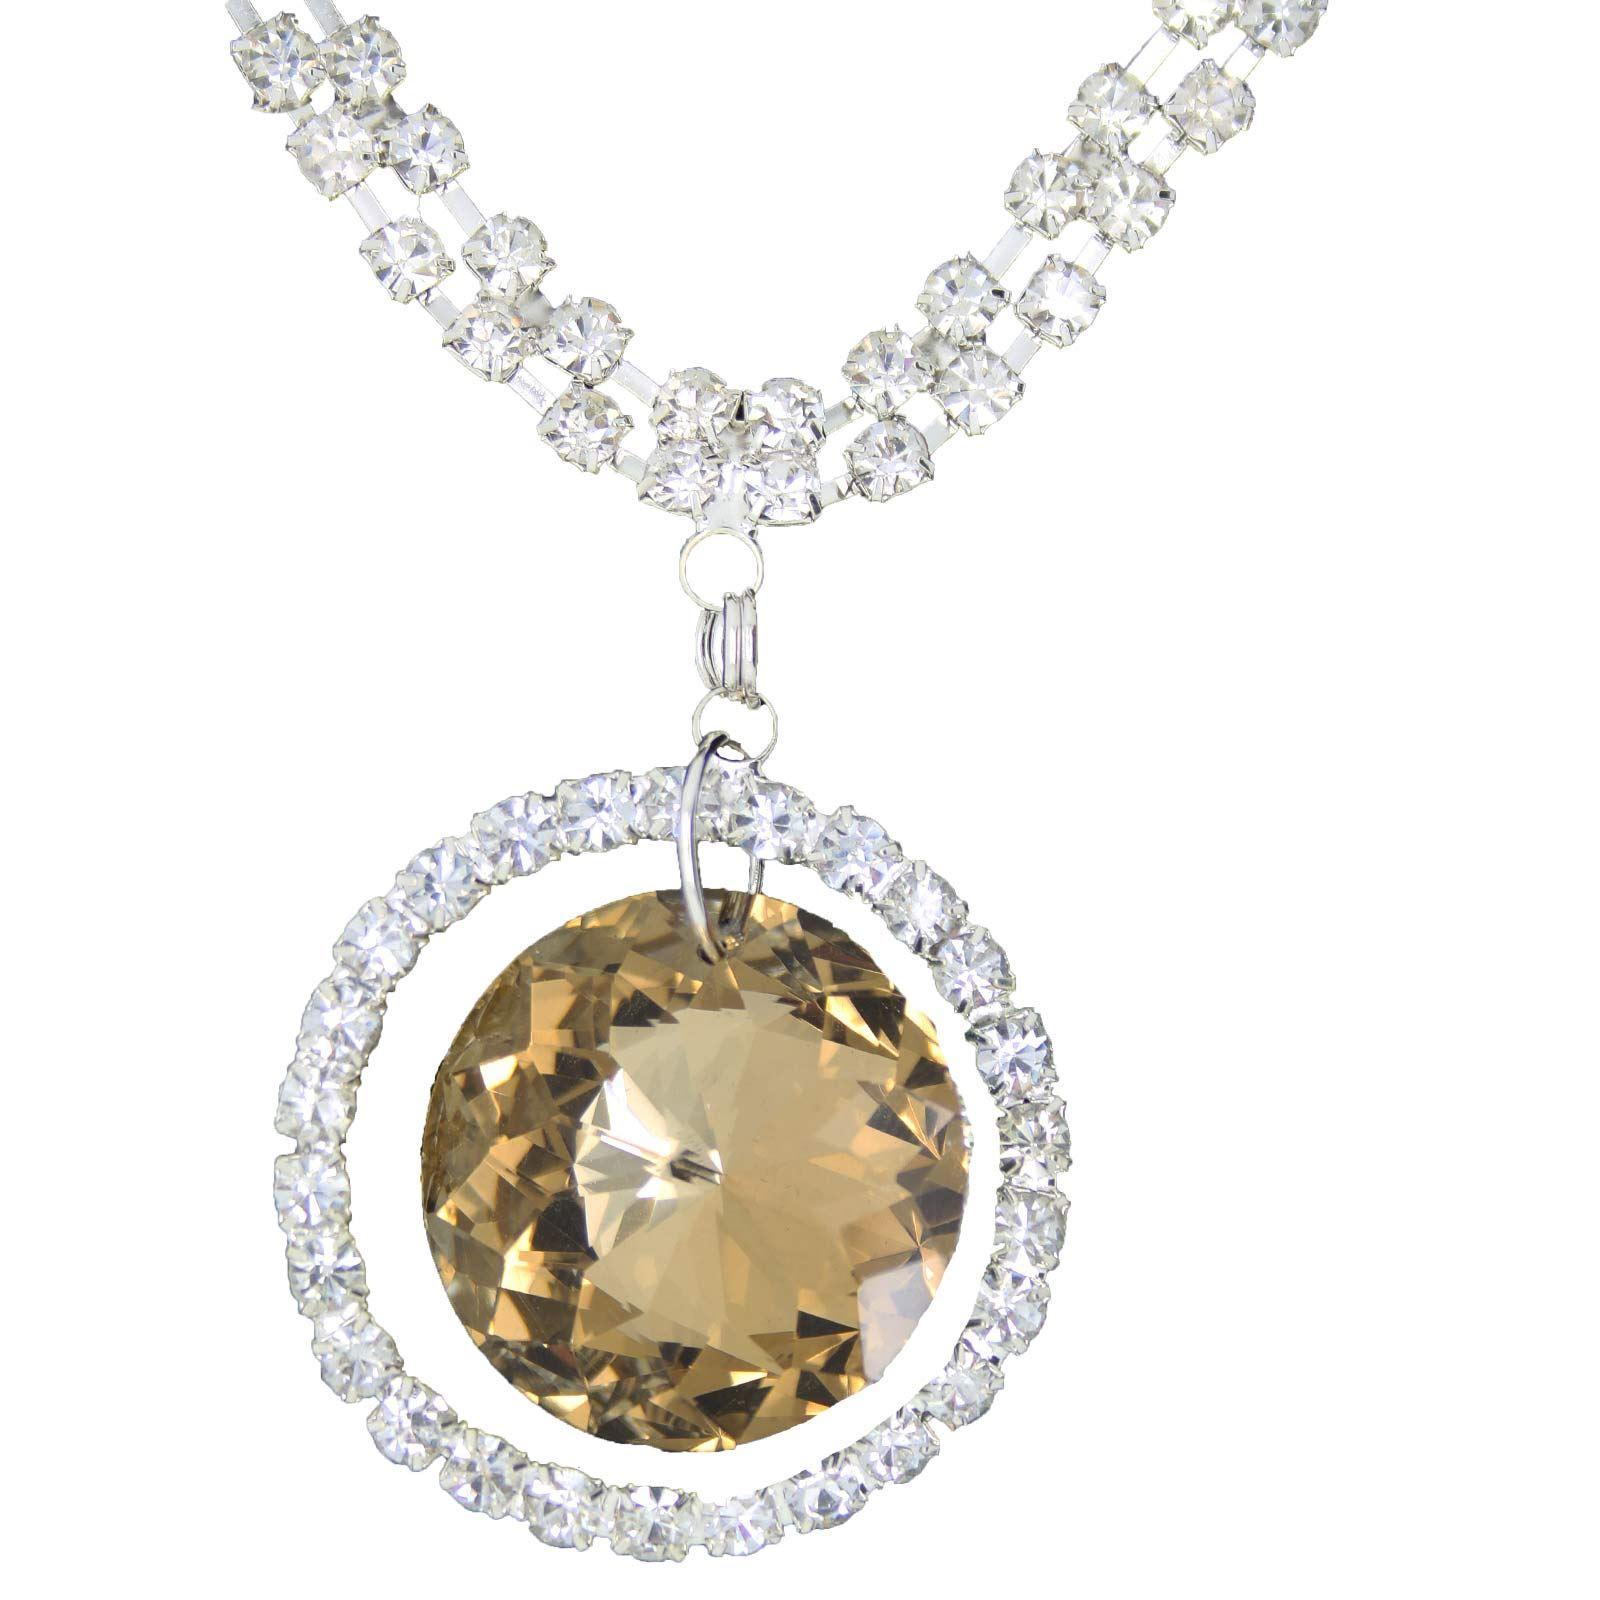 True-Face-Ladies-Women-039-s-Elegant-Earrings-Necklace-Set-Metal-Alloy-Jewellery thumbnail 33